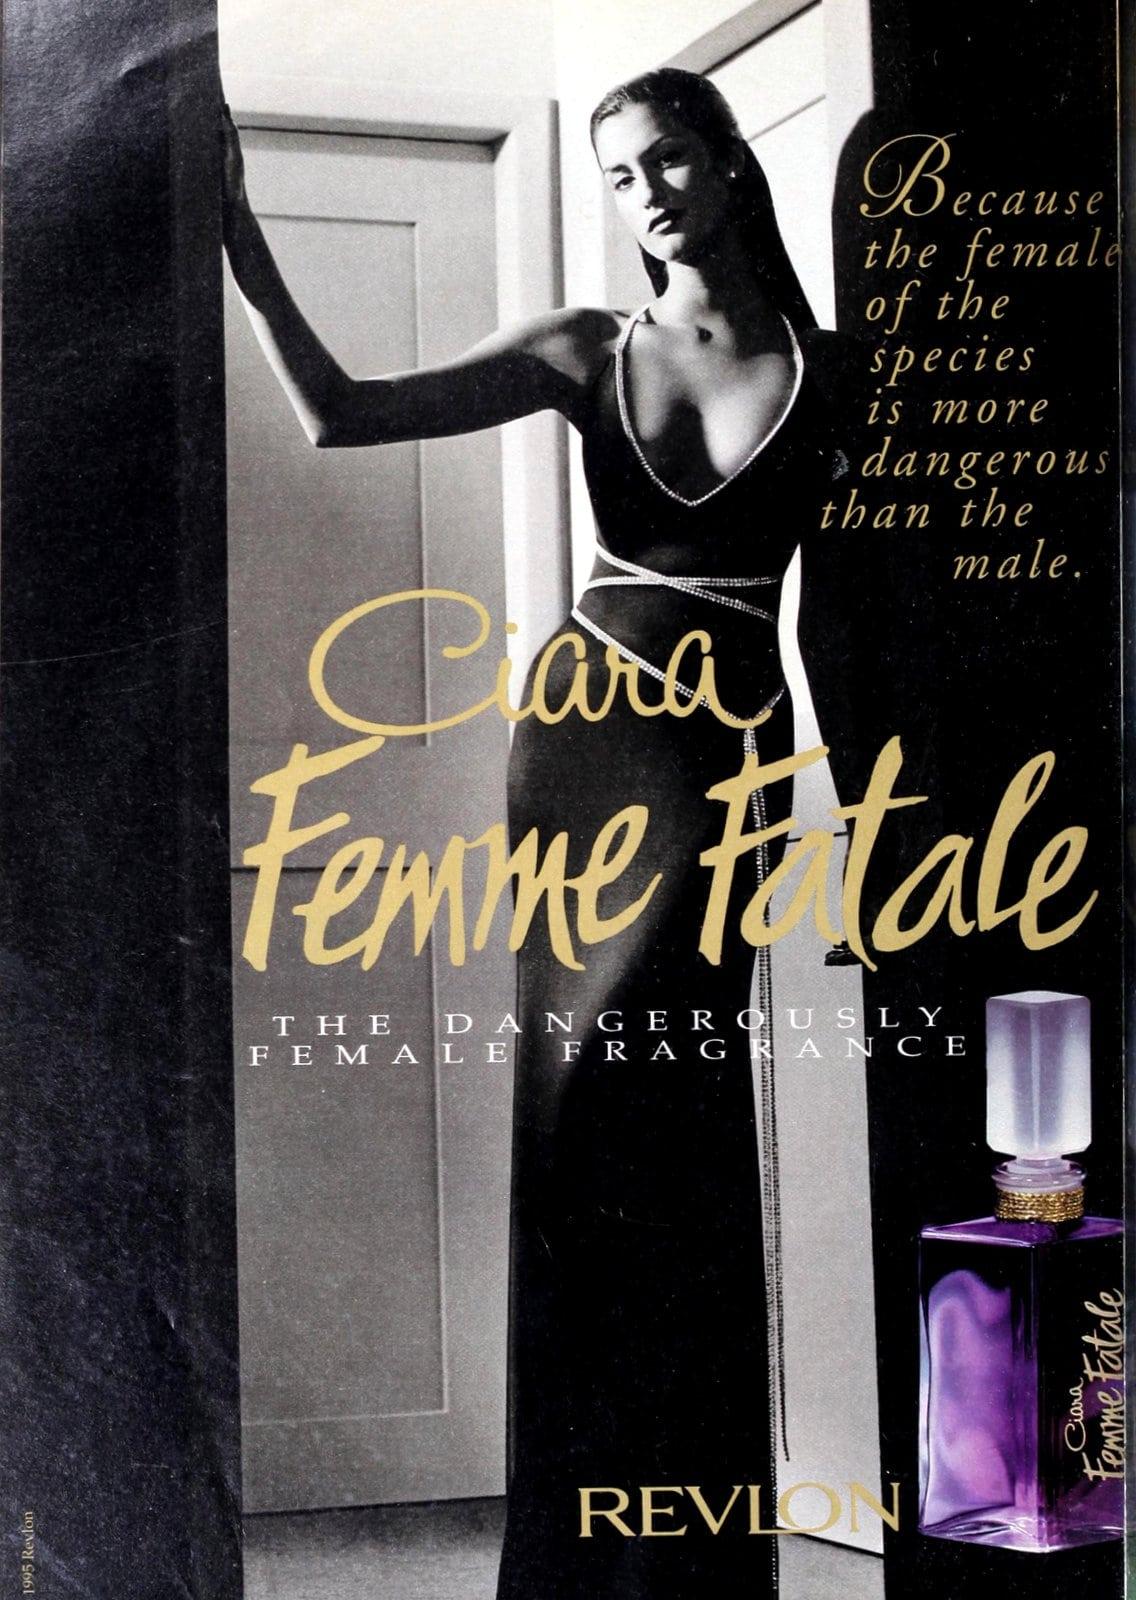 Ciara Femme Fatale fragrance from Revlon (1995) at ClickAmericana.com